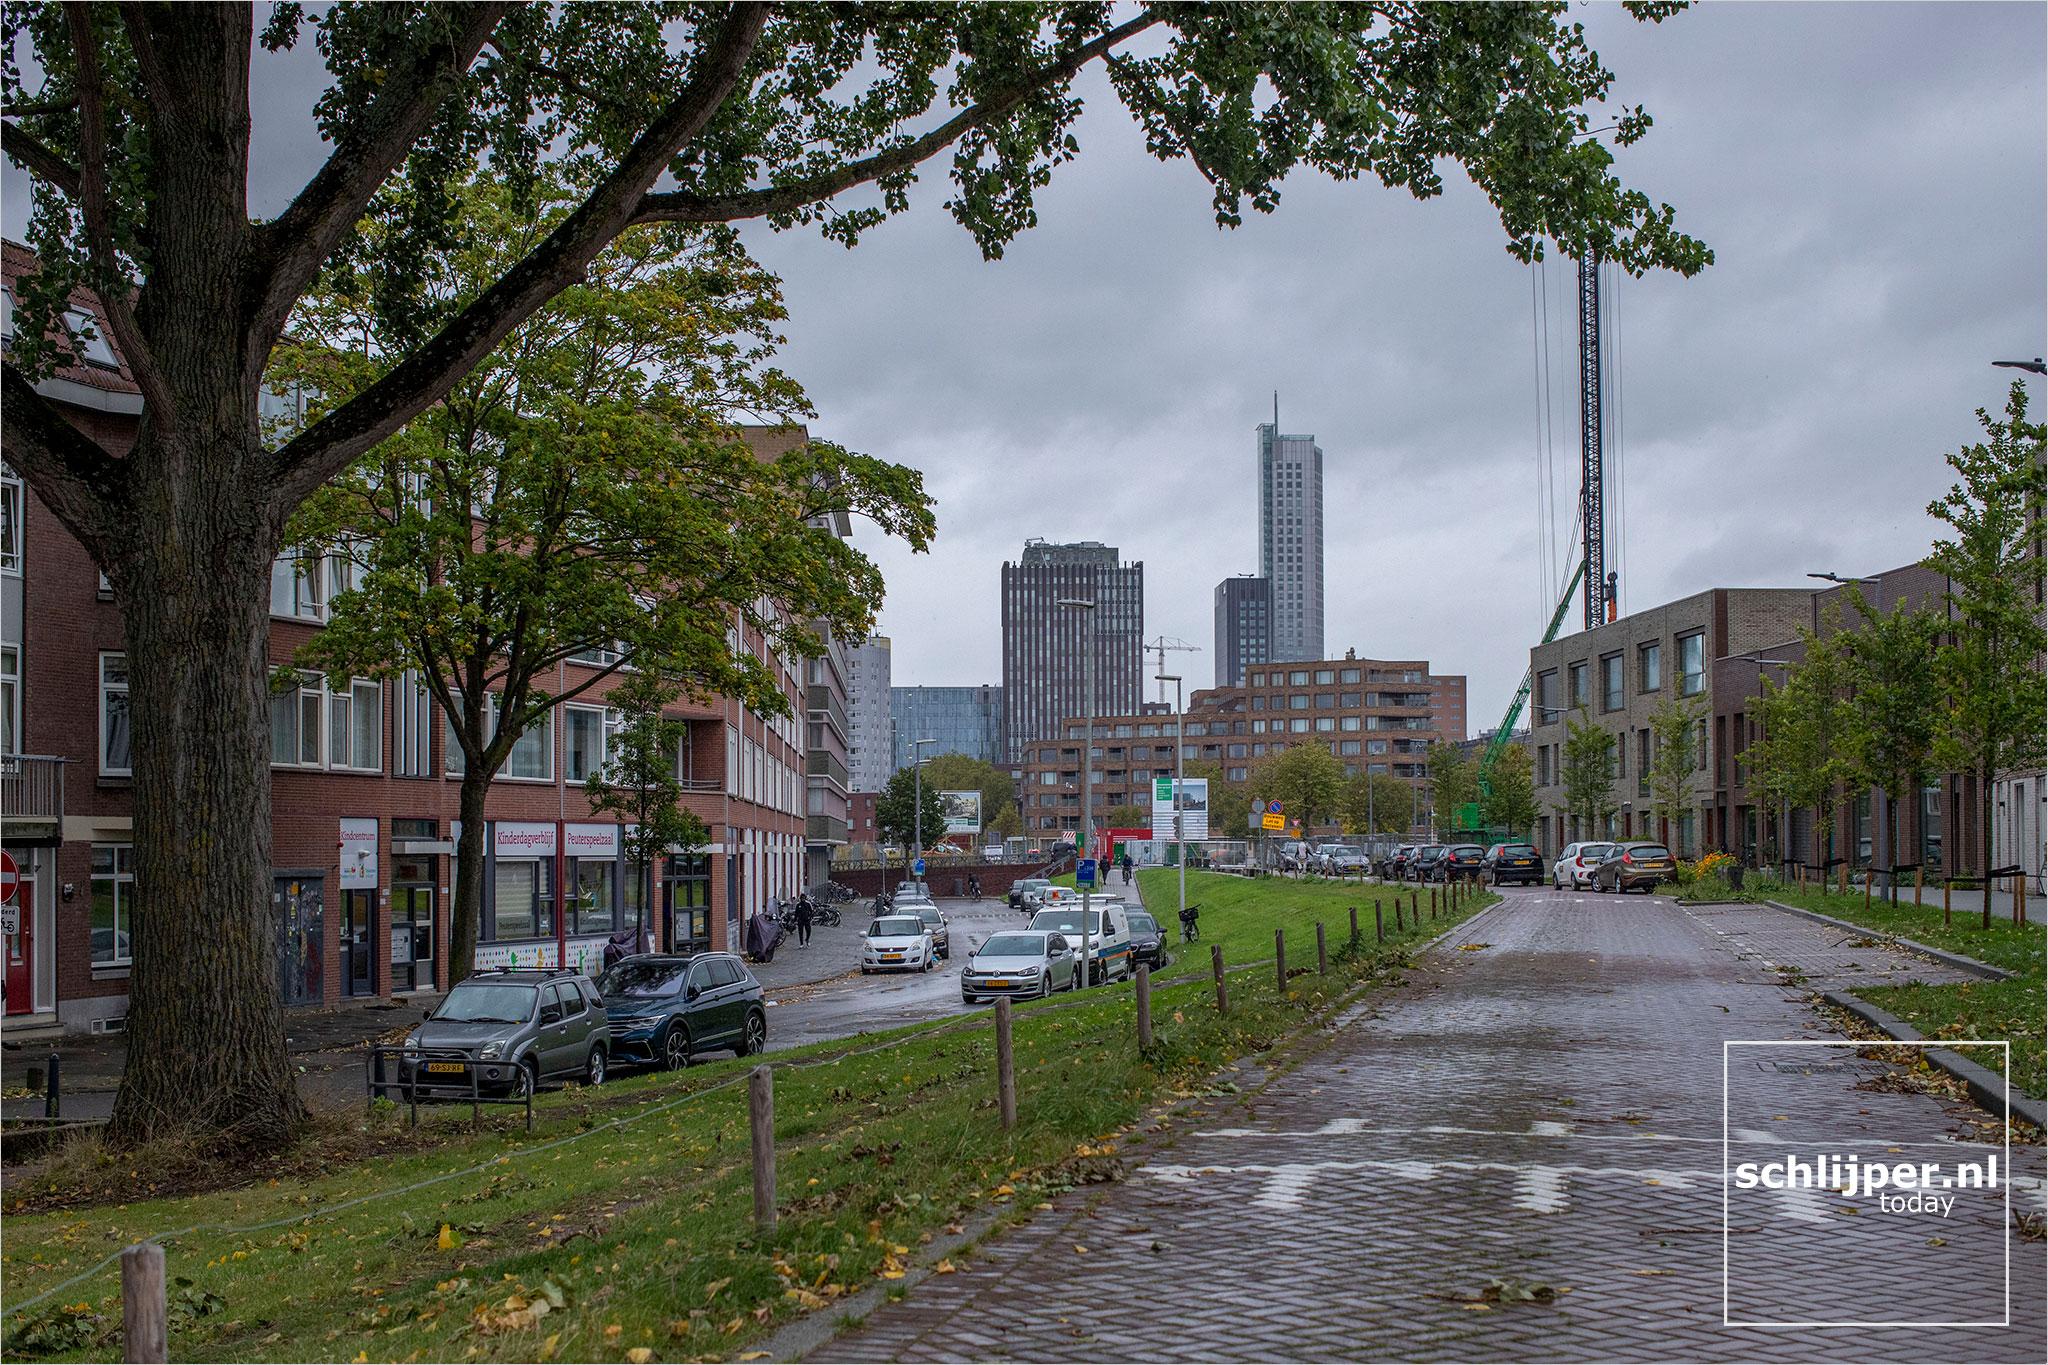 The Netherlands, Rotterdam, 5 oktober 2021